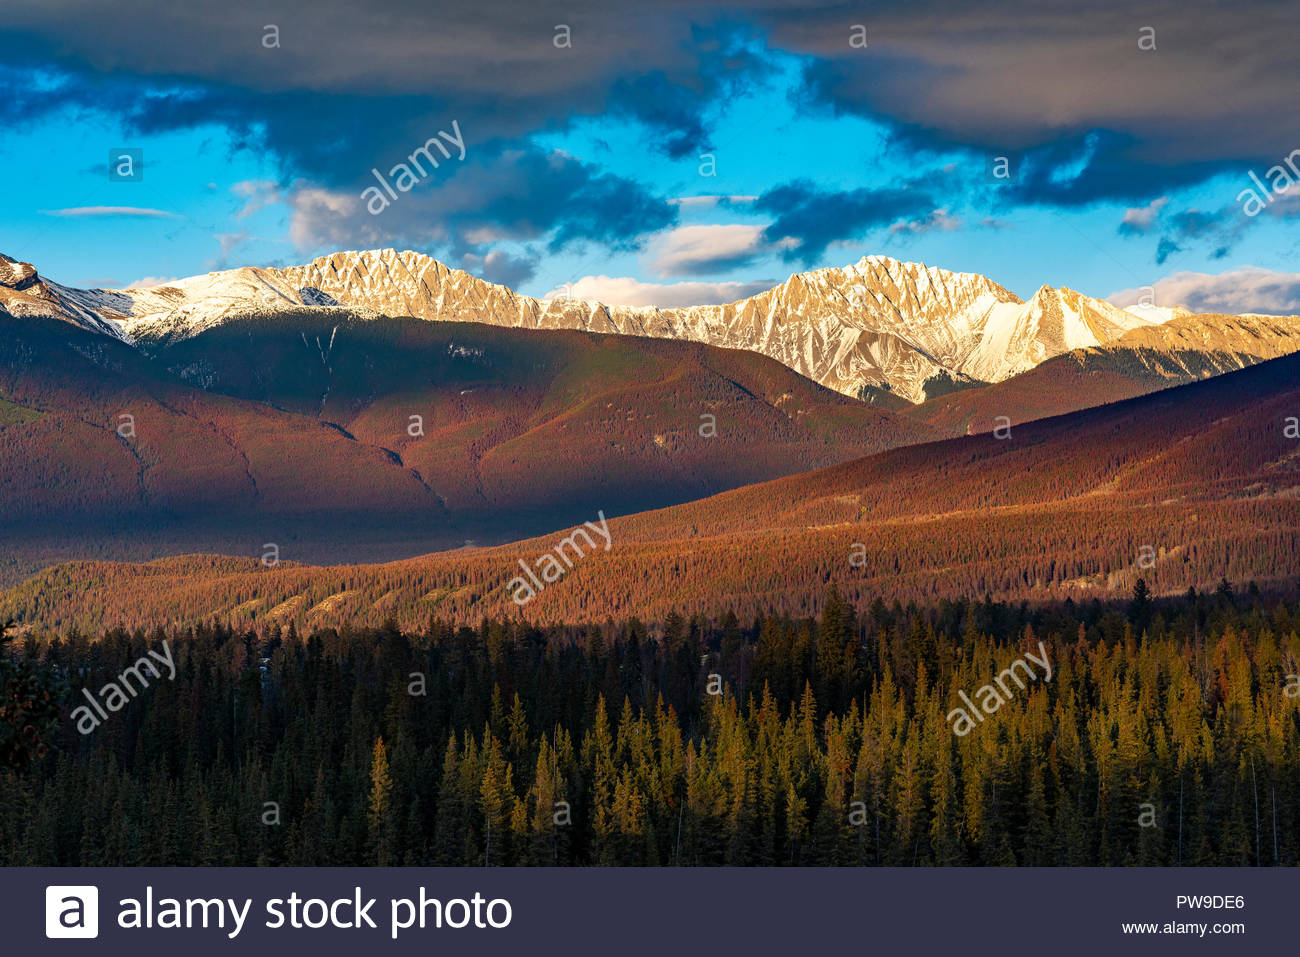 Mountain pine beetle killed trees, Jasper National Park, Alberta, Canada - Stock Image